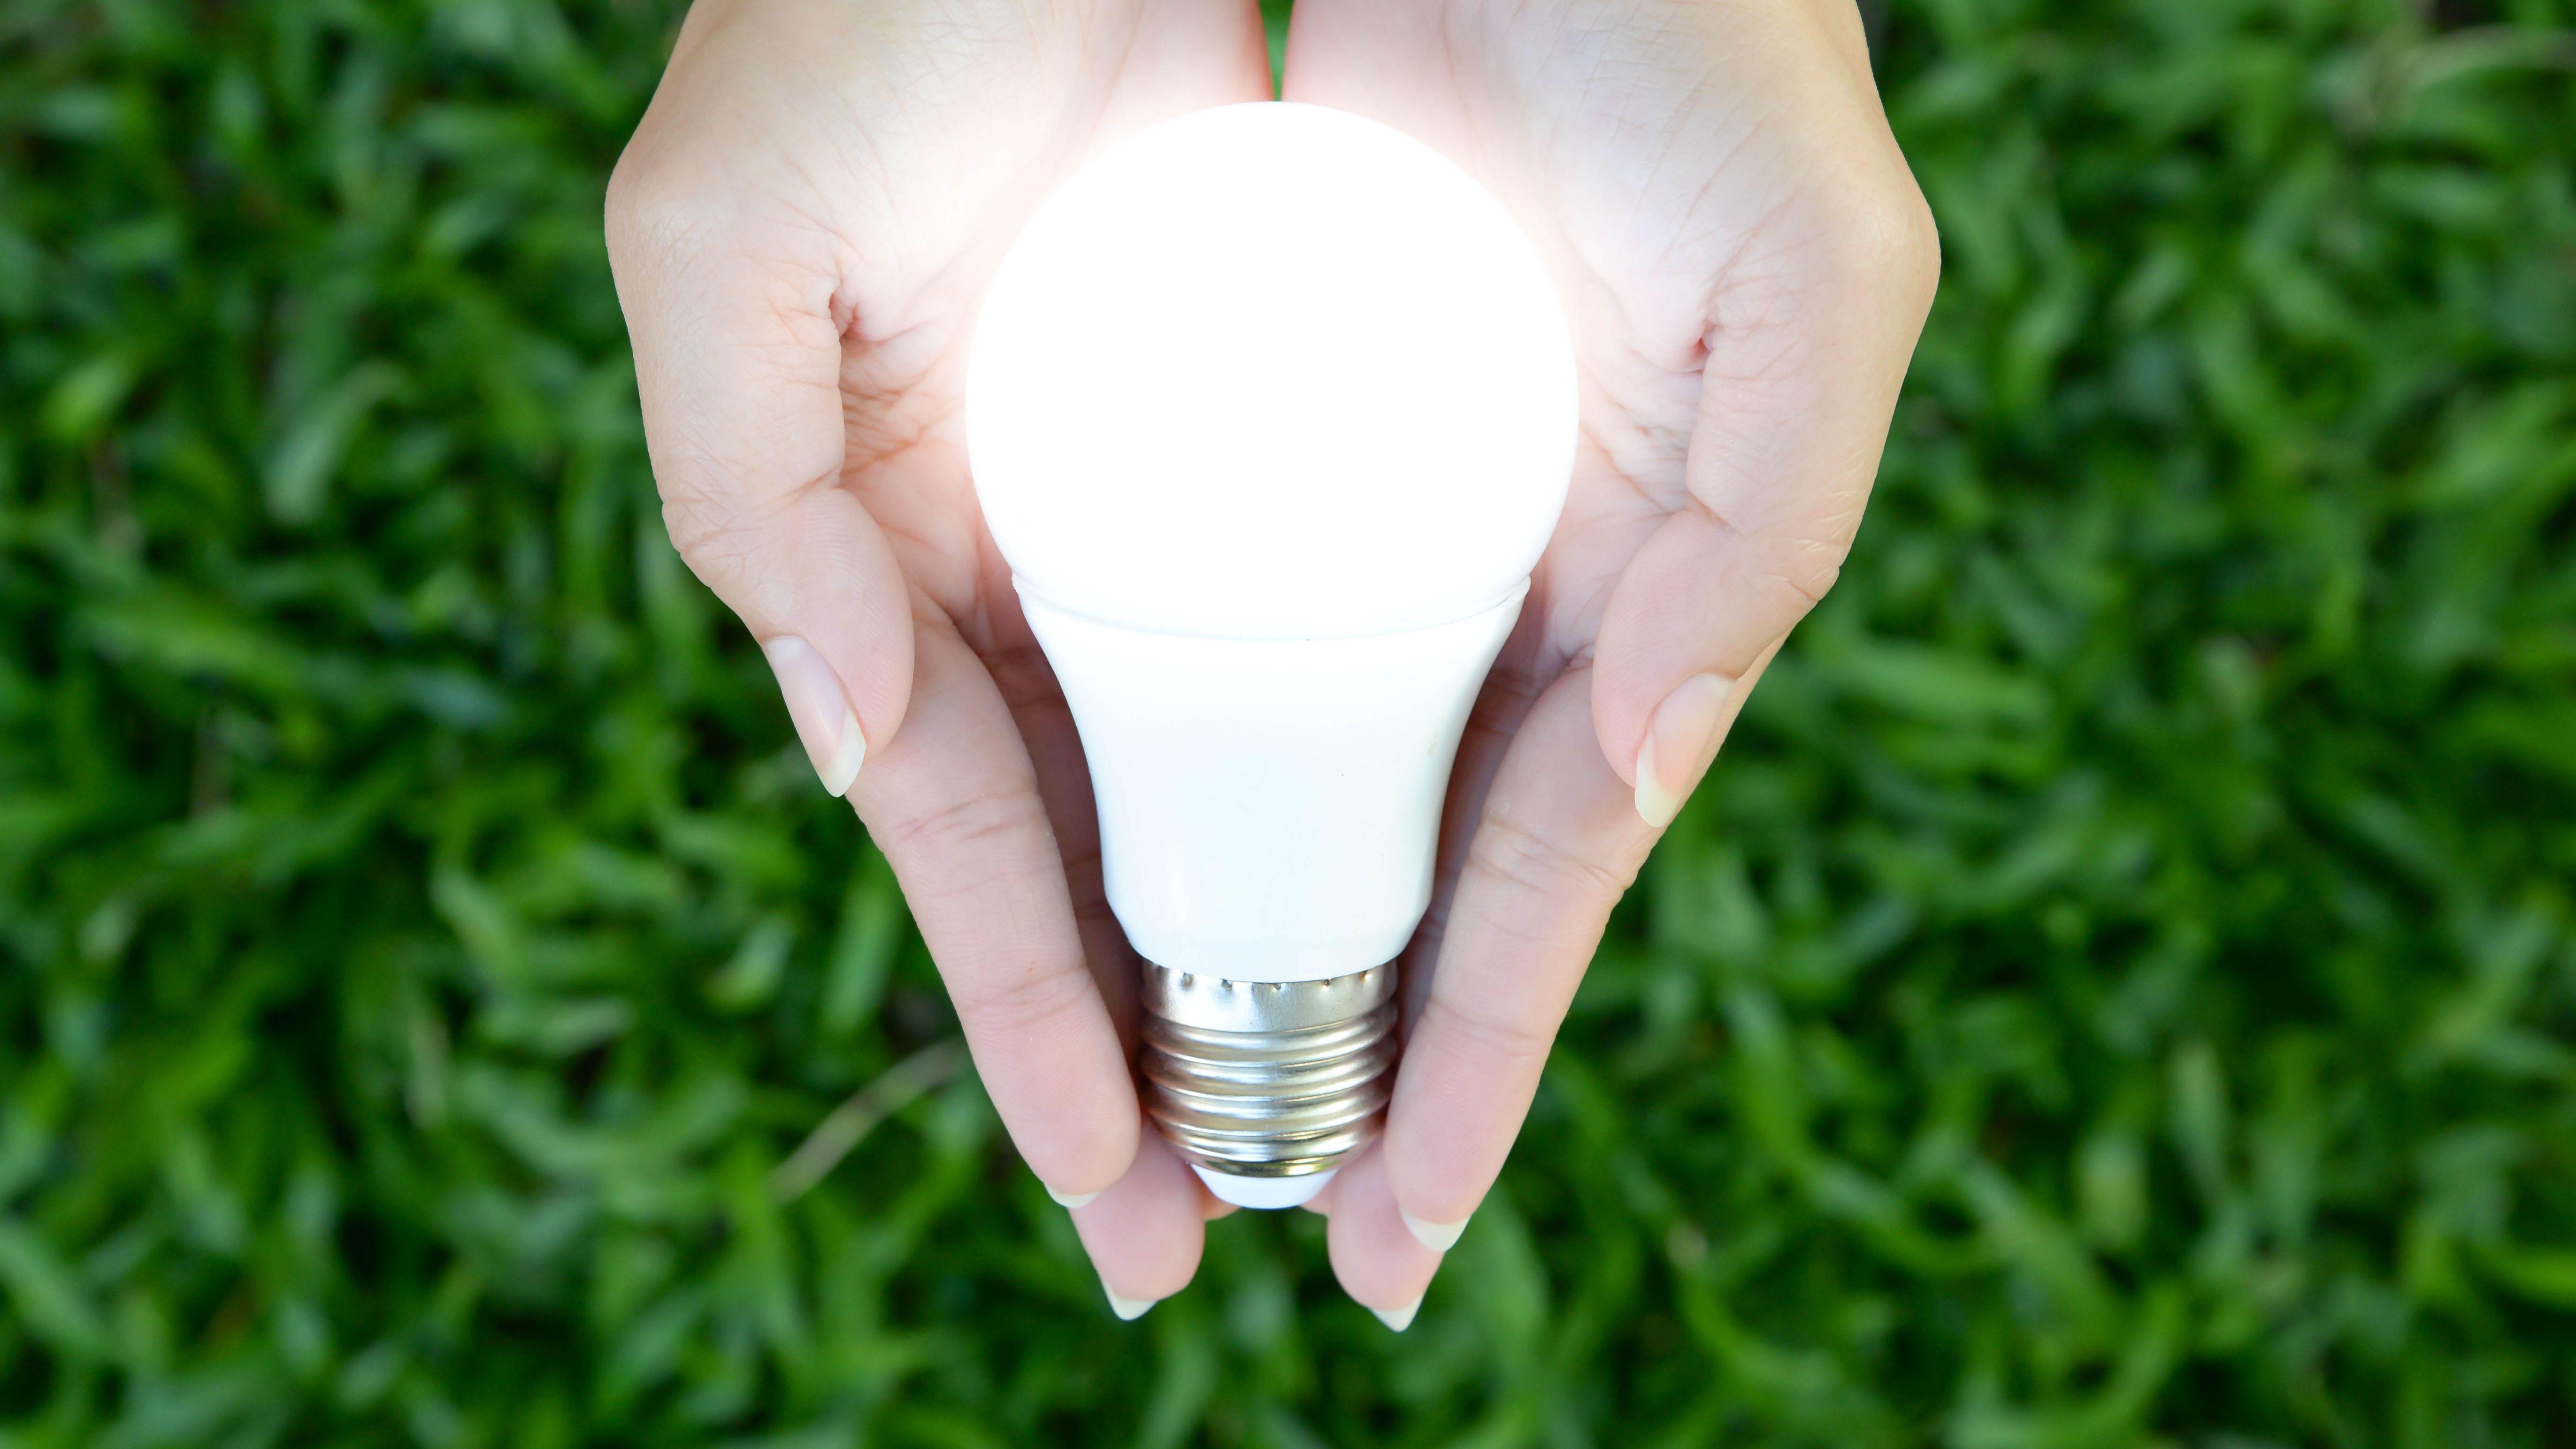 LED: Advantages and disadvantages